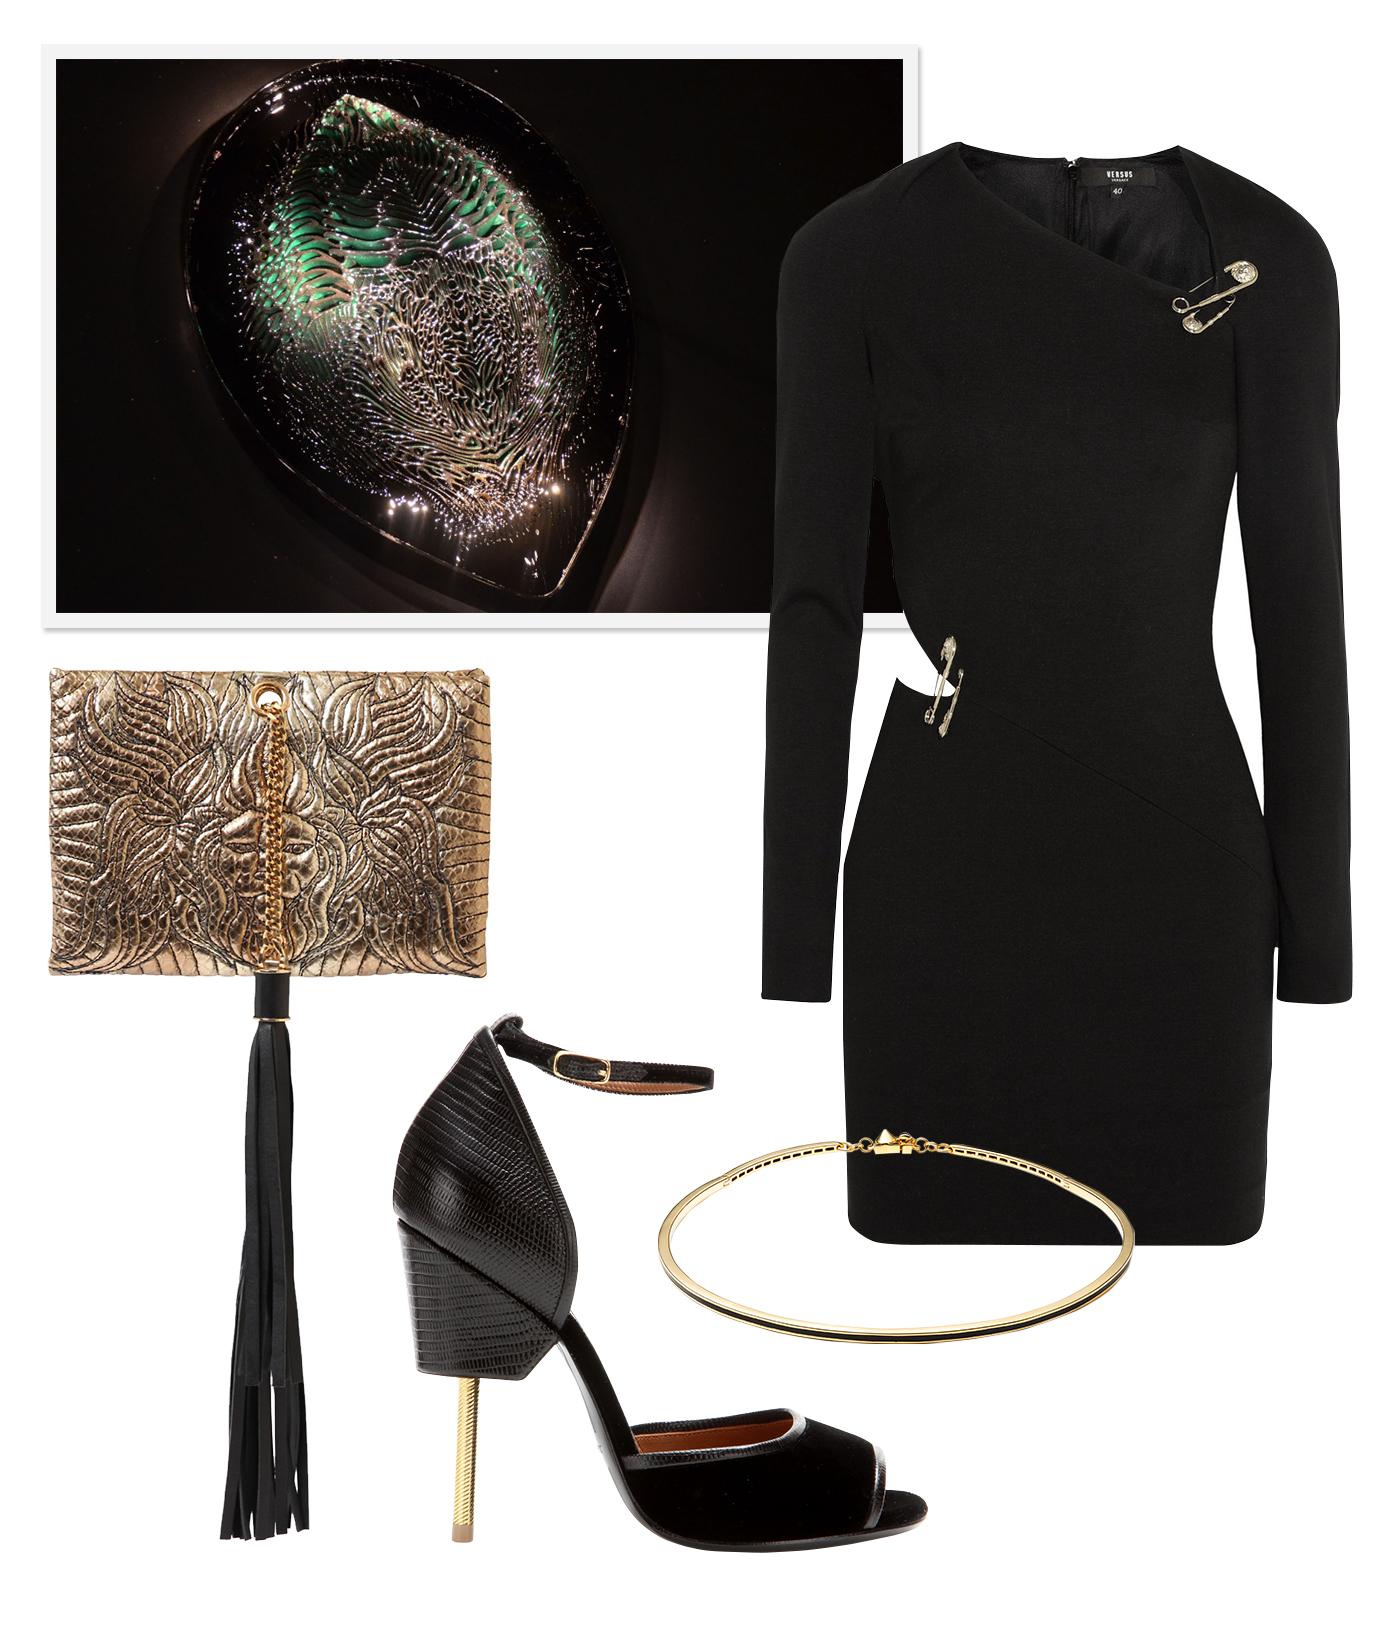 art-basel-outfit-ideas_04.jpg